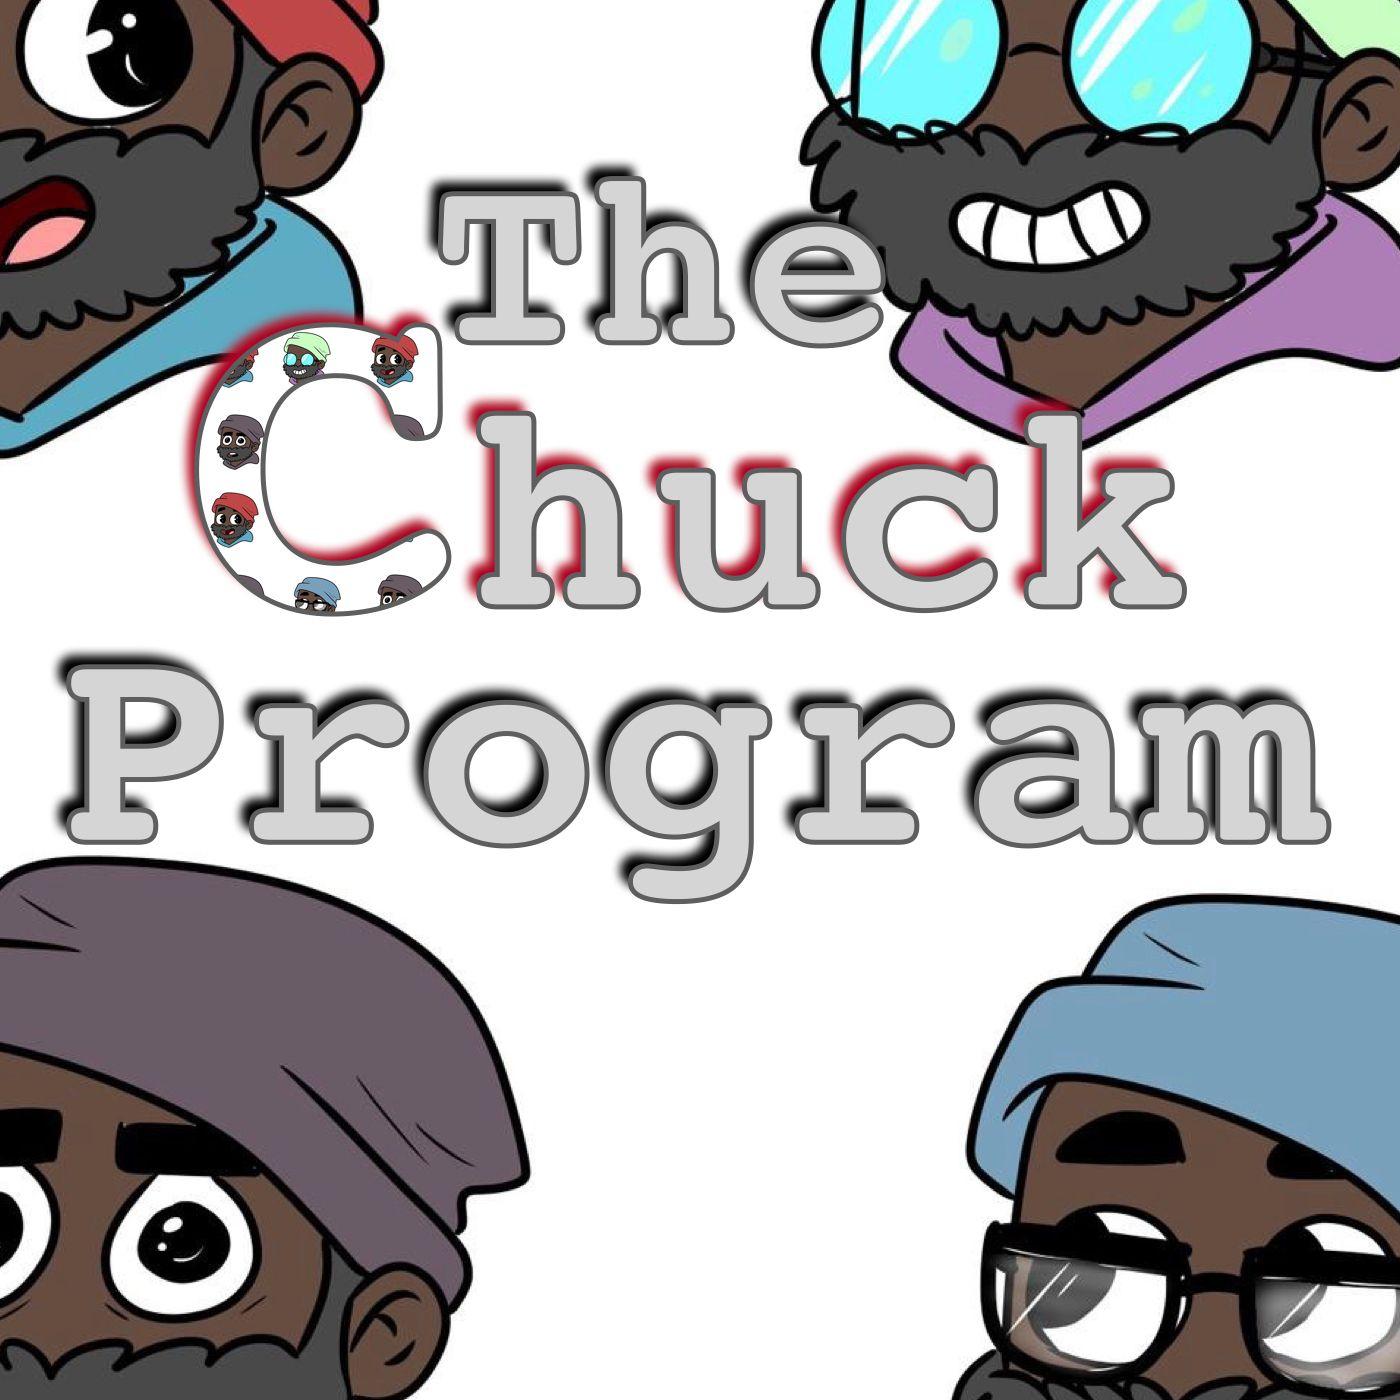 The Chuck Program